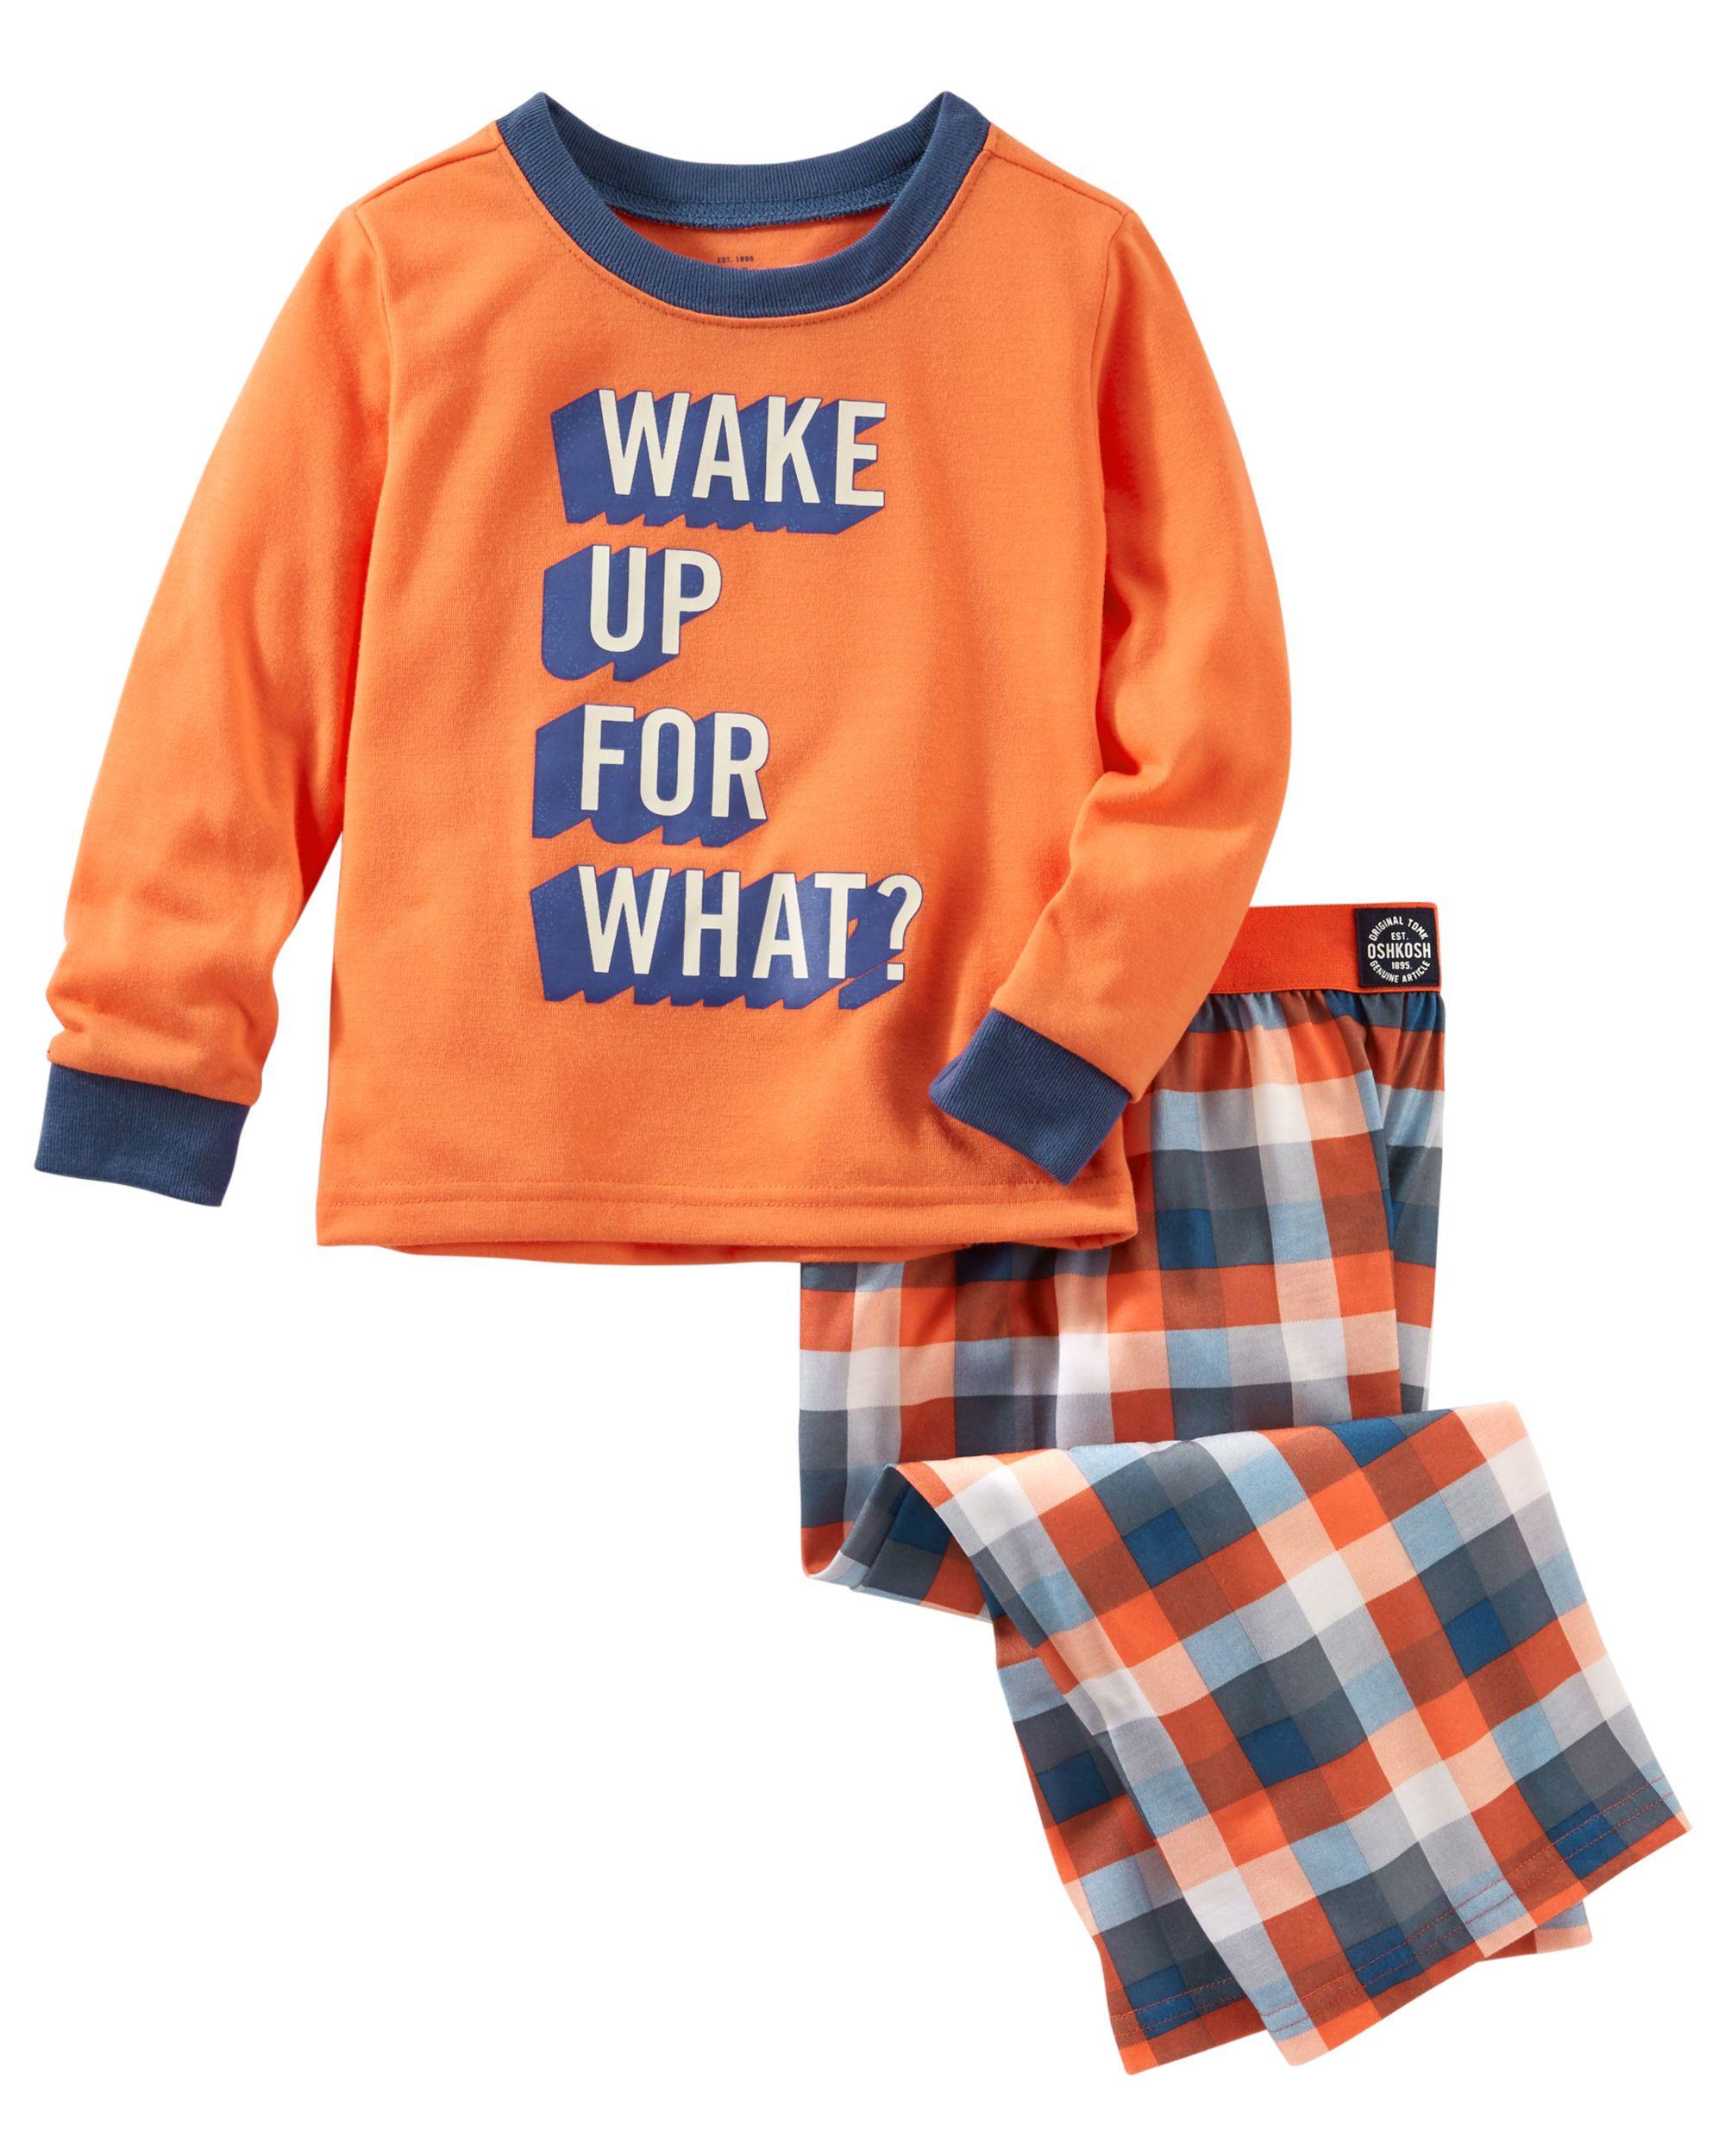 Kids Clothes, Boy, Girl & Toddler Clothes   OshKosh B'gosh